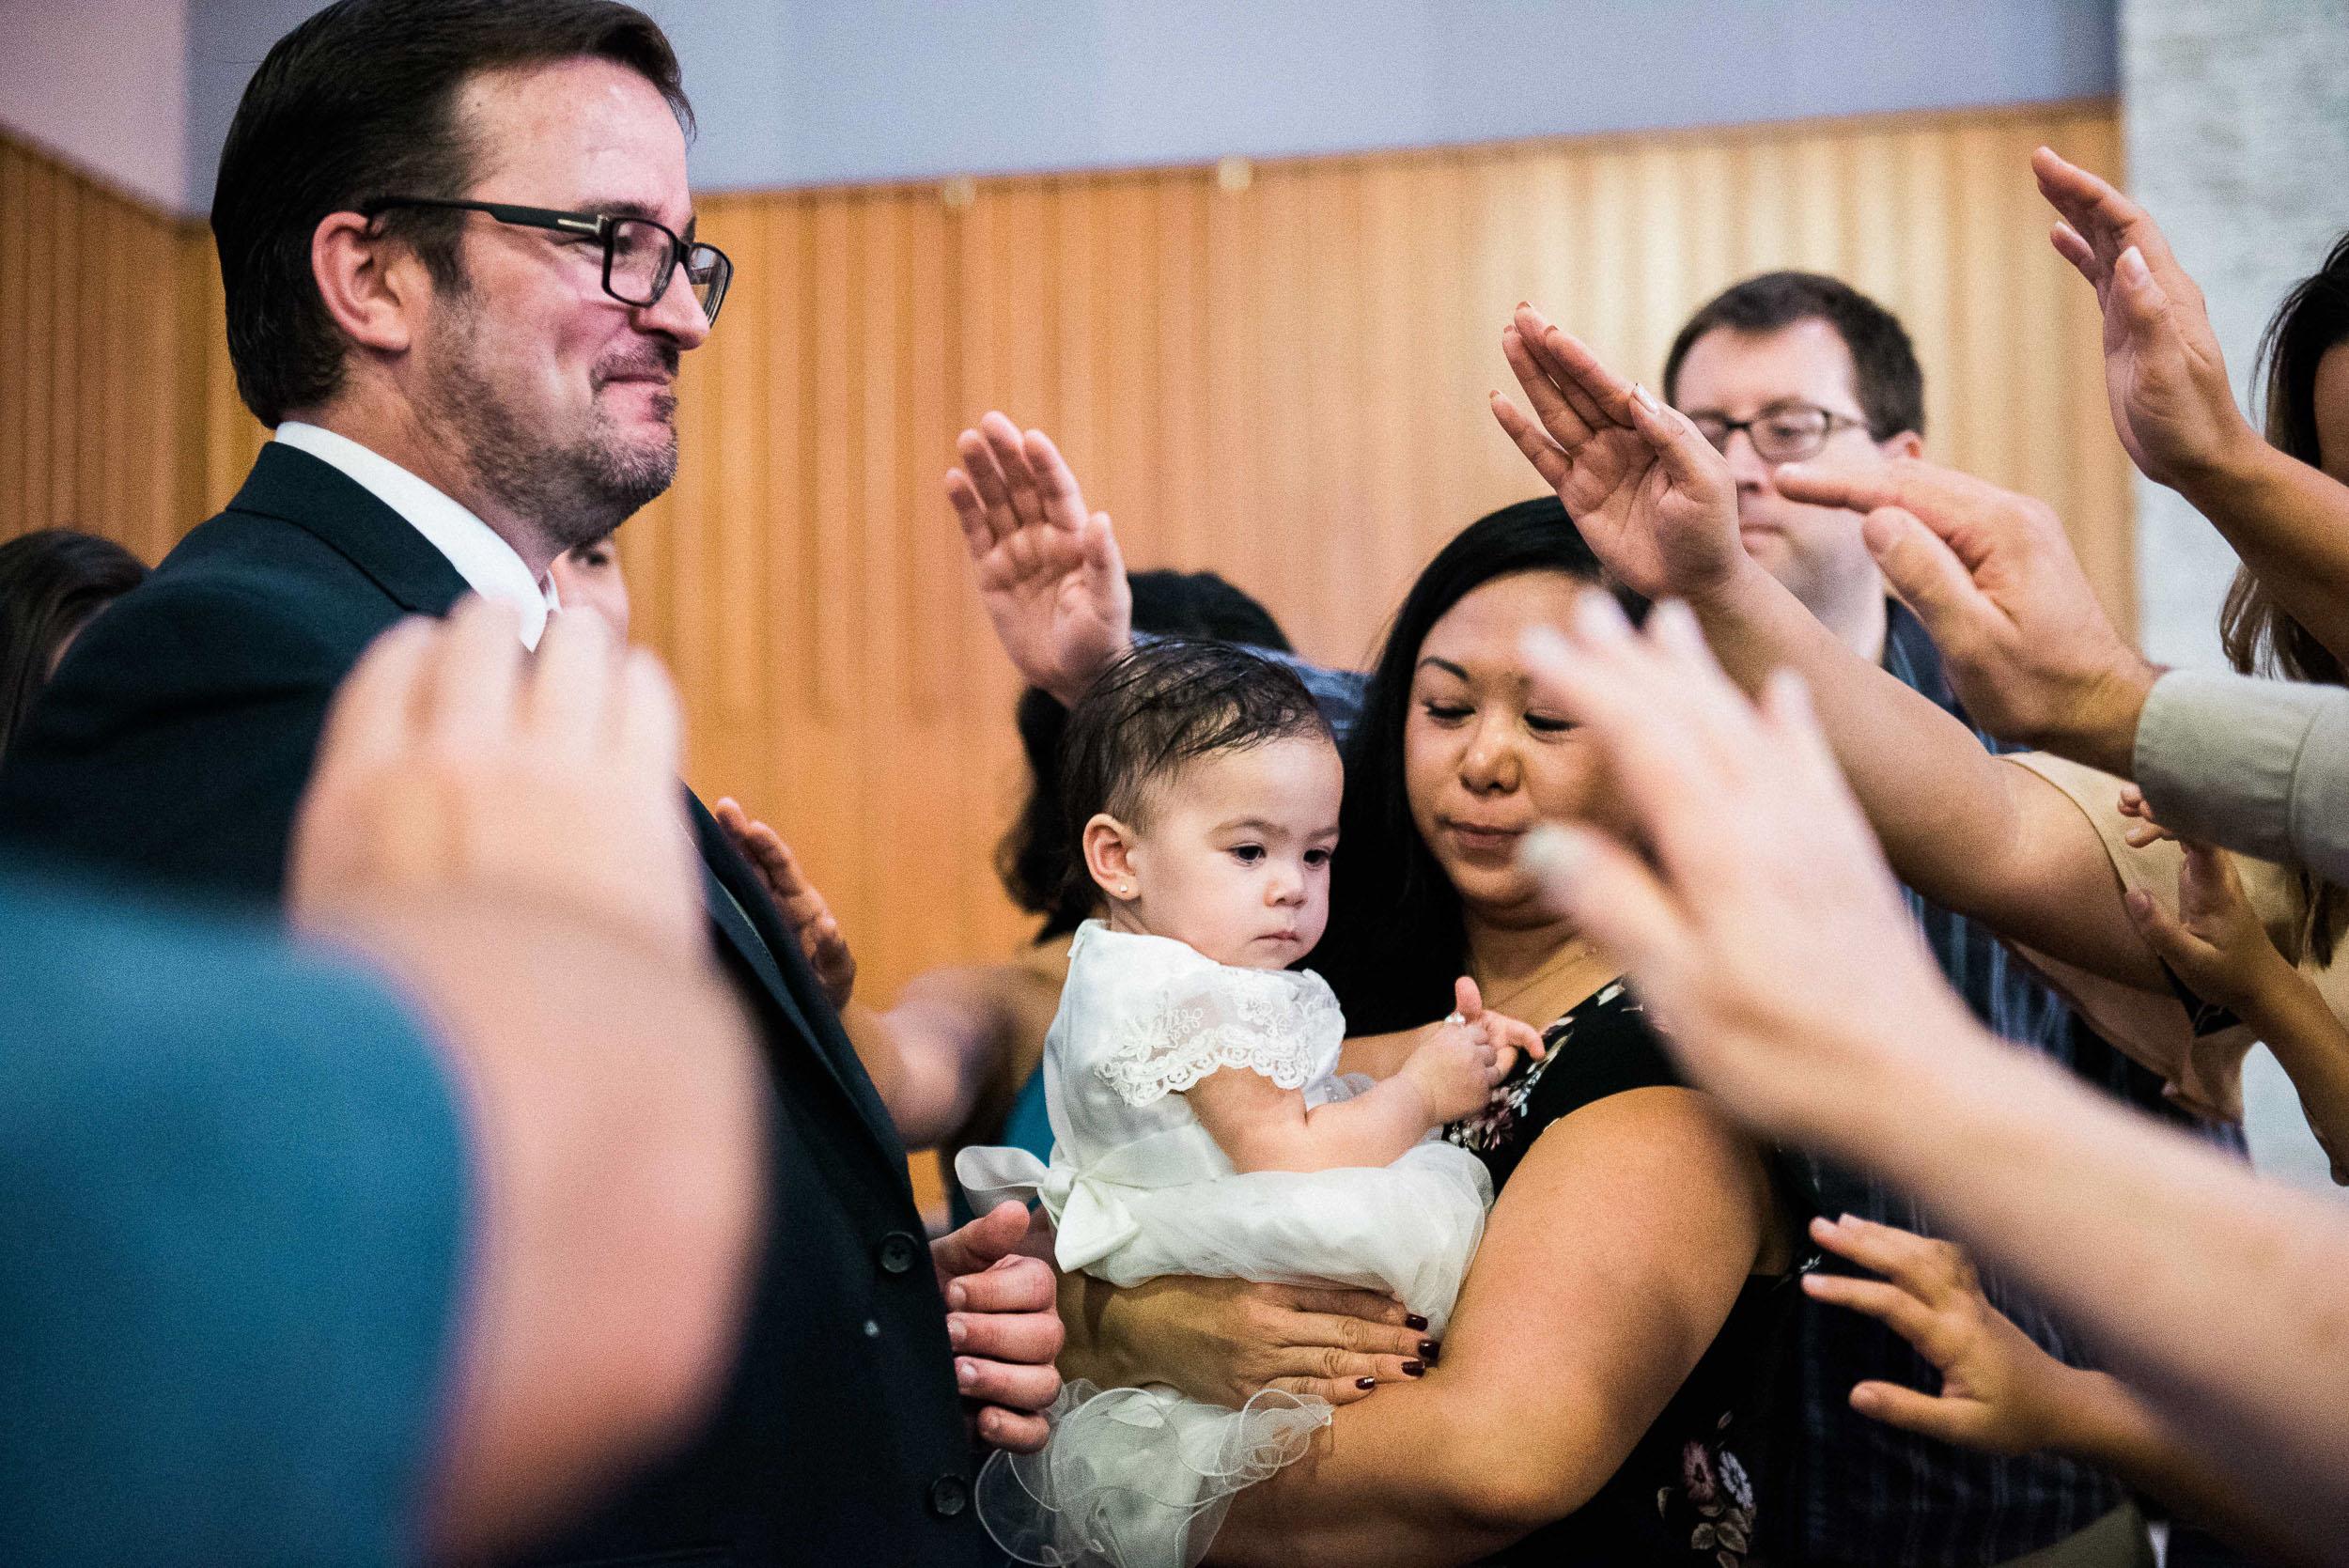 Bryan-Miraflor-Photo-Allison-Baptism-Church-20171014-0211.jpg